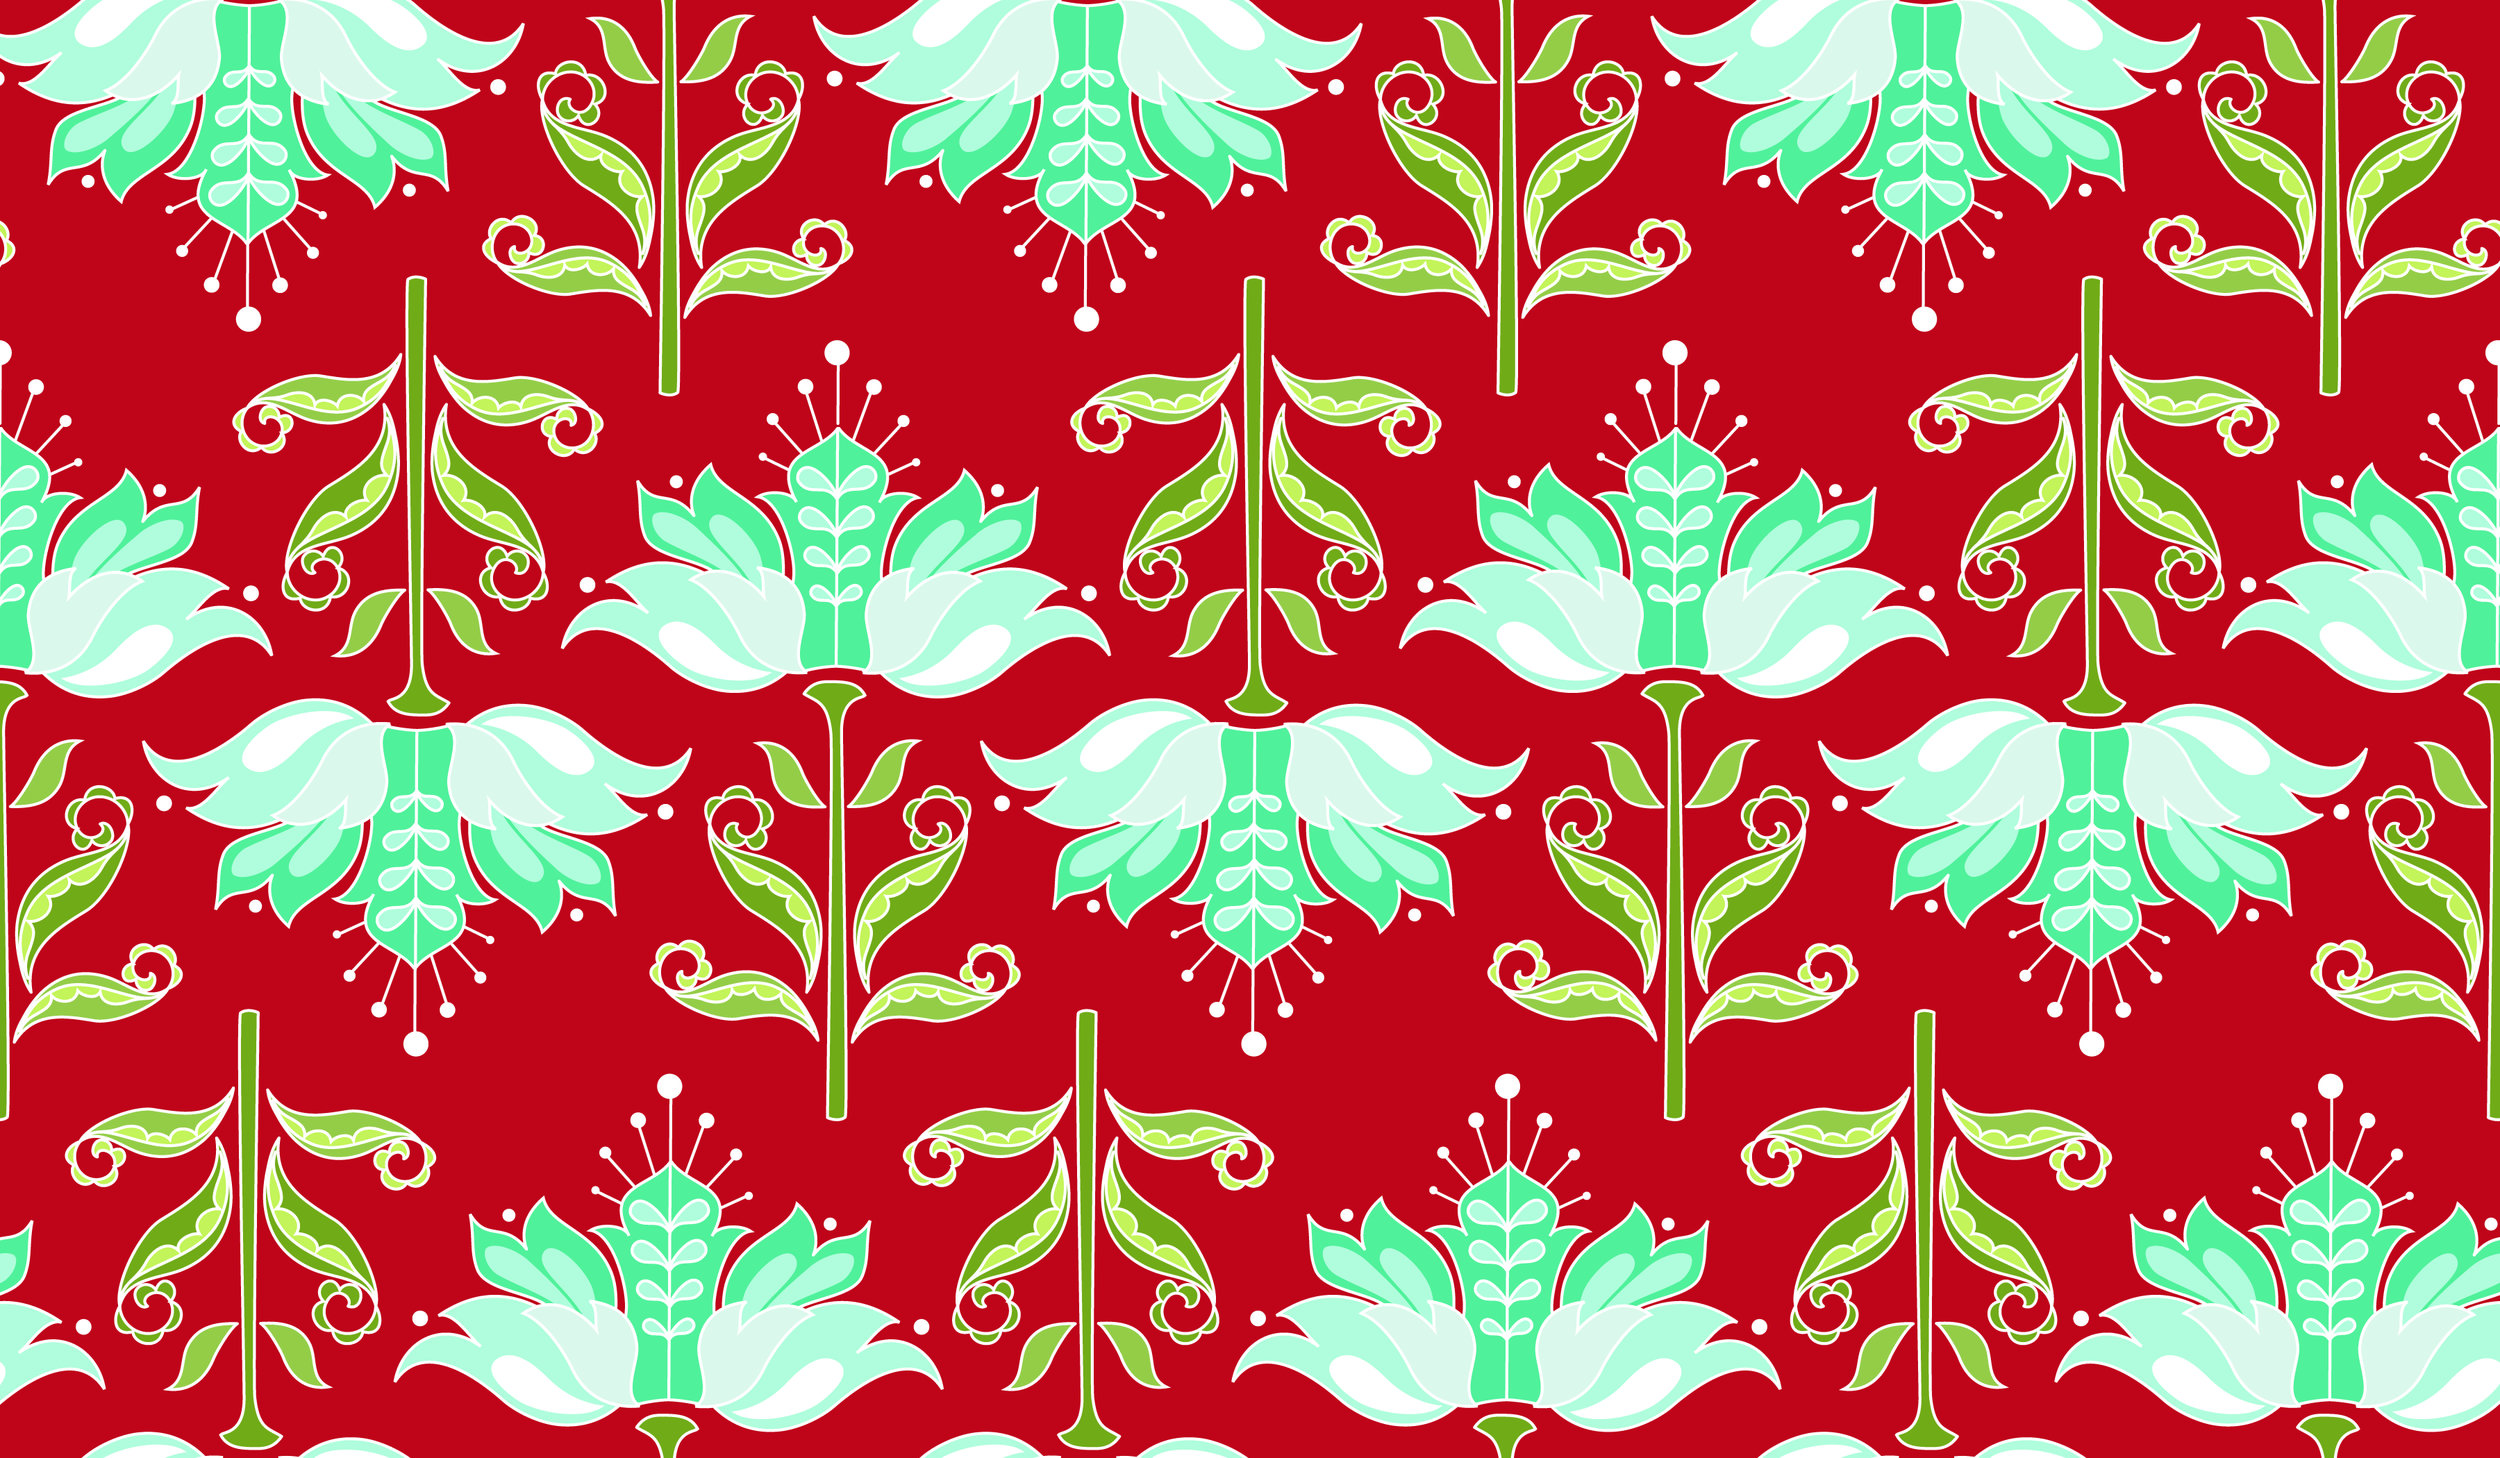 secondary red-01.jpg